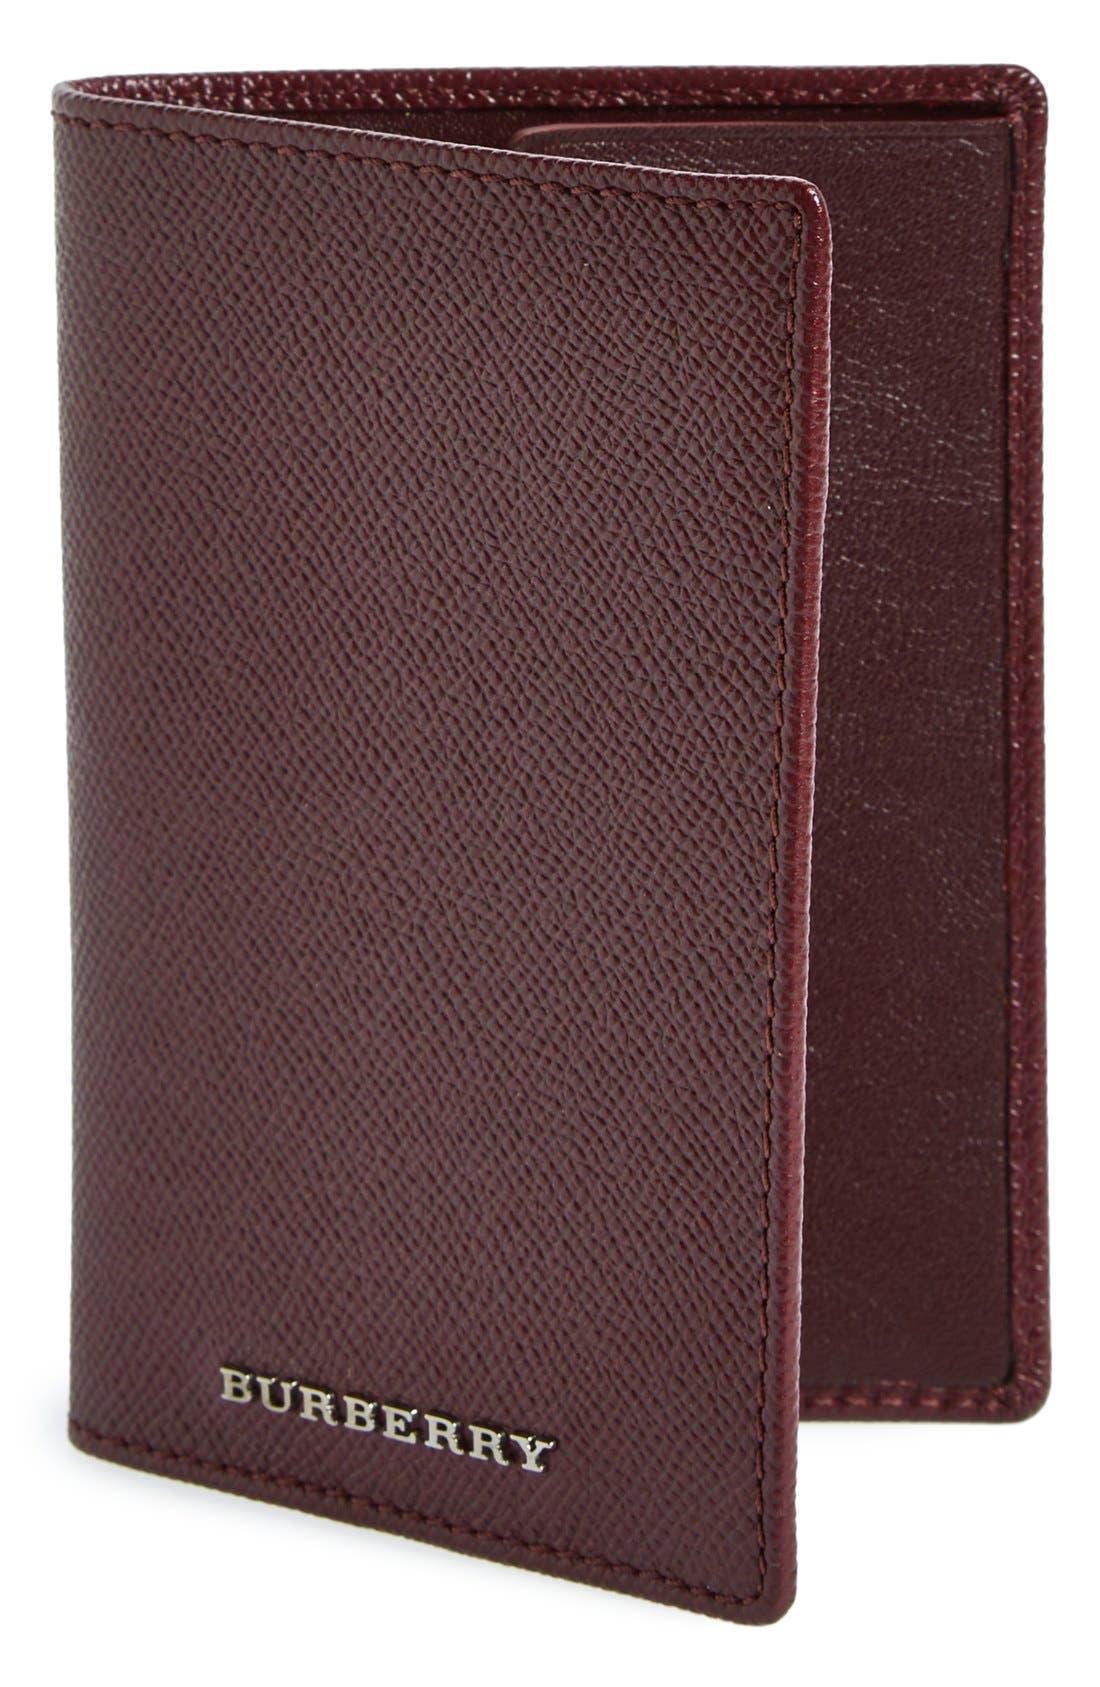 BURBERRY Leather Passport Case, Main, color, 600